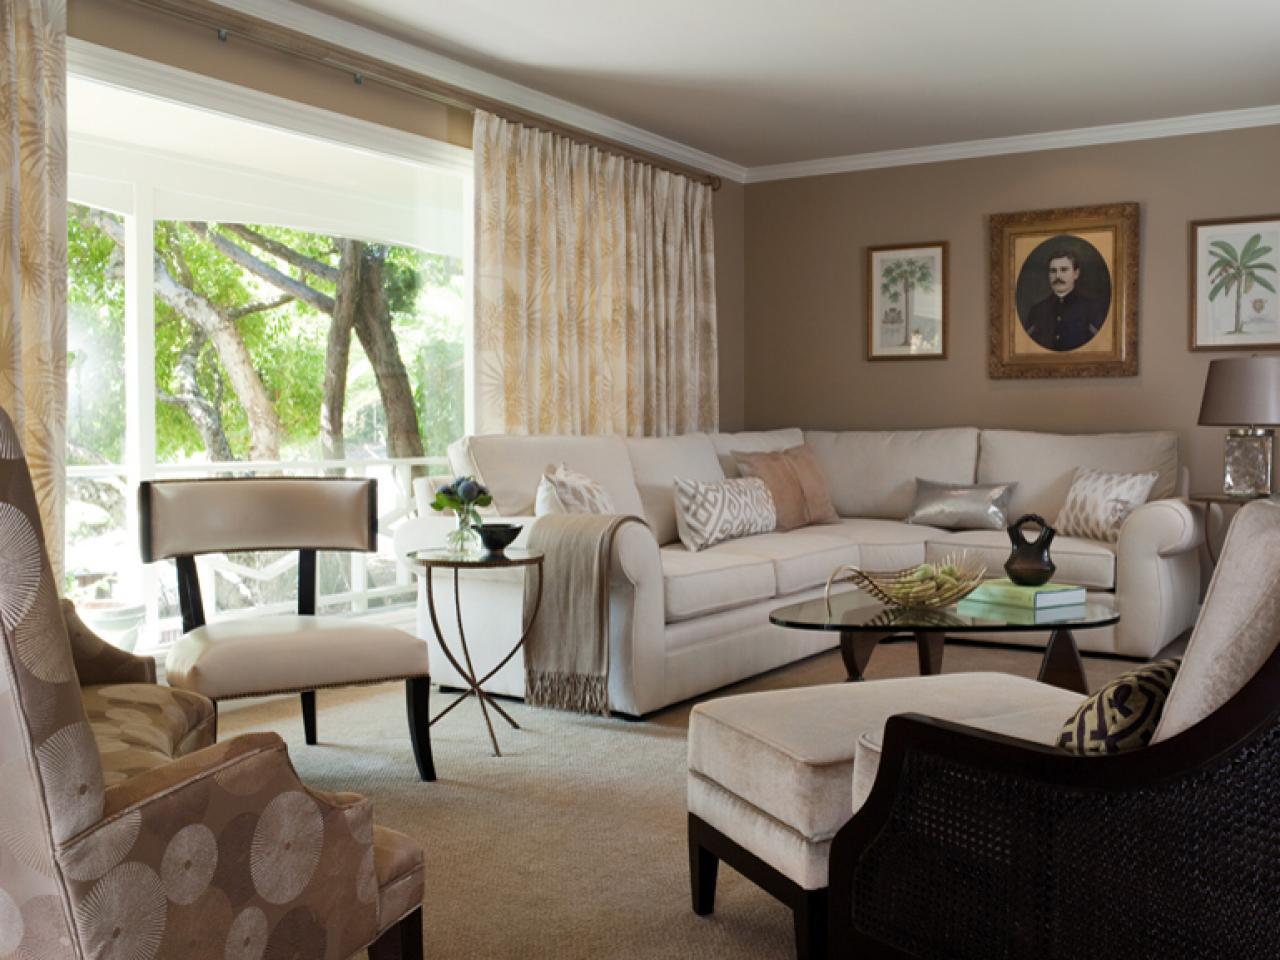 Contemporary Living Room Makeover | Jean Larette | HGTV